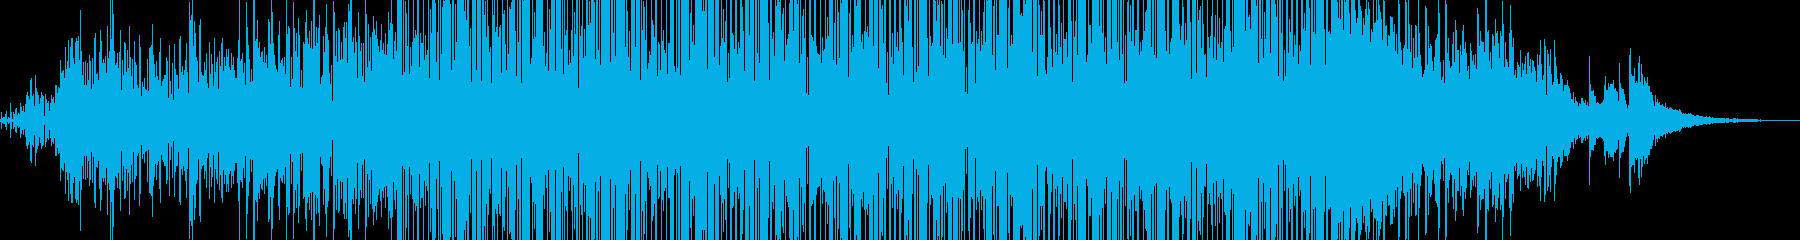 KANT無機質混沌BGM200611の再生済みの波形